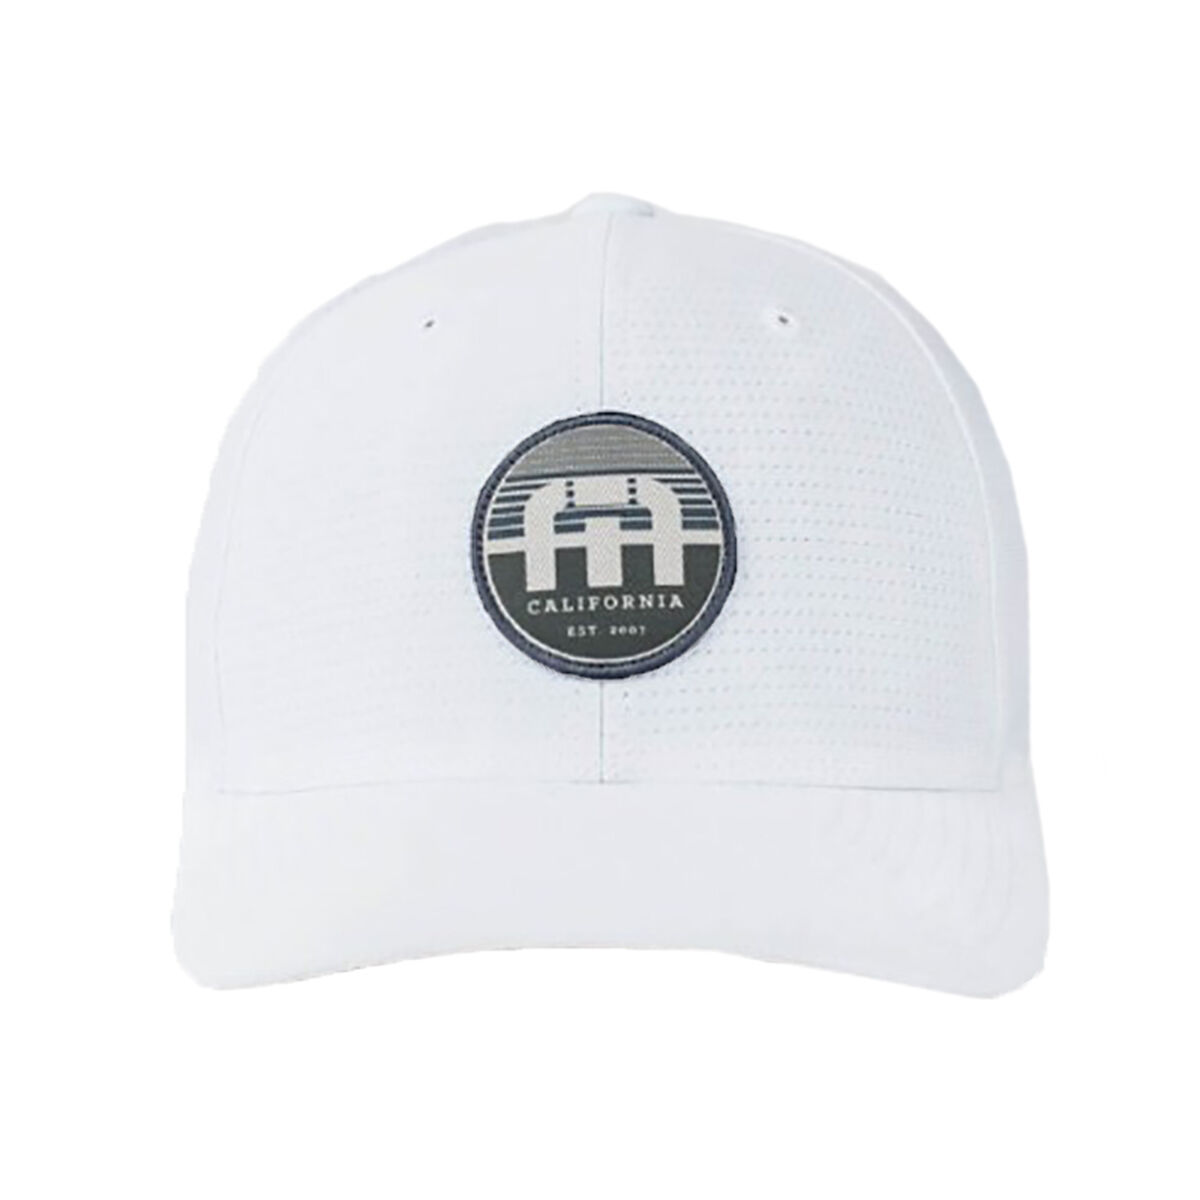 low priced 4e459 0324b TravisMathew Septor Hat Zoom Image